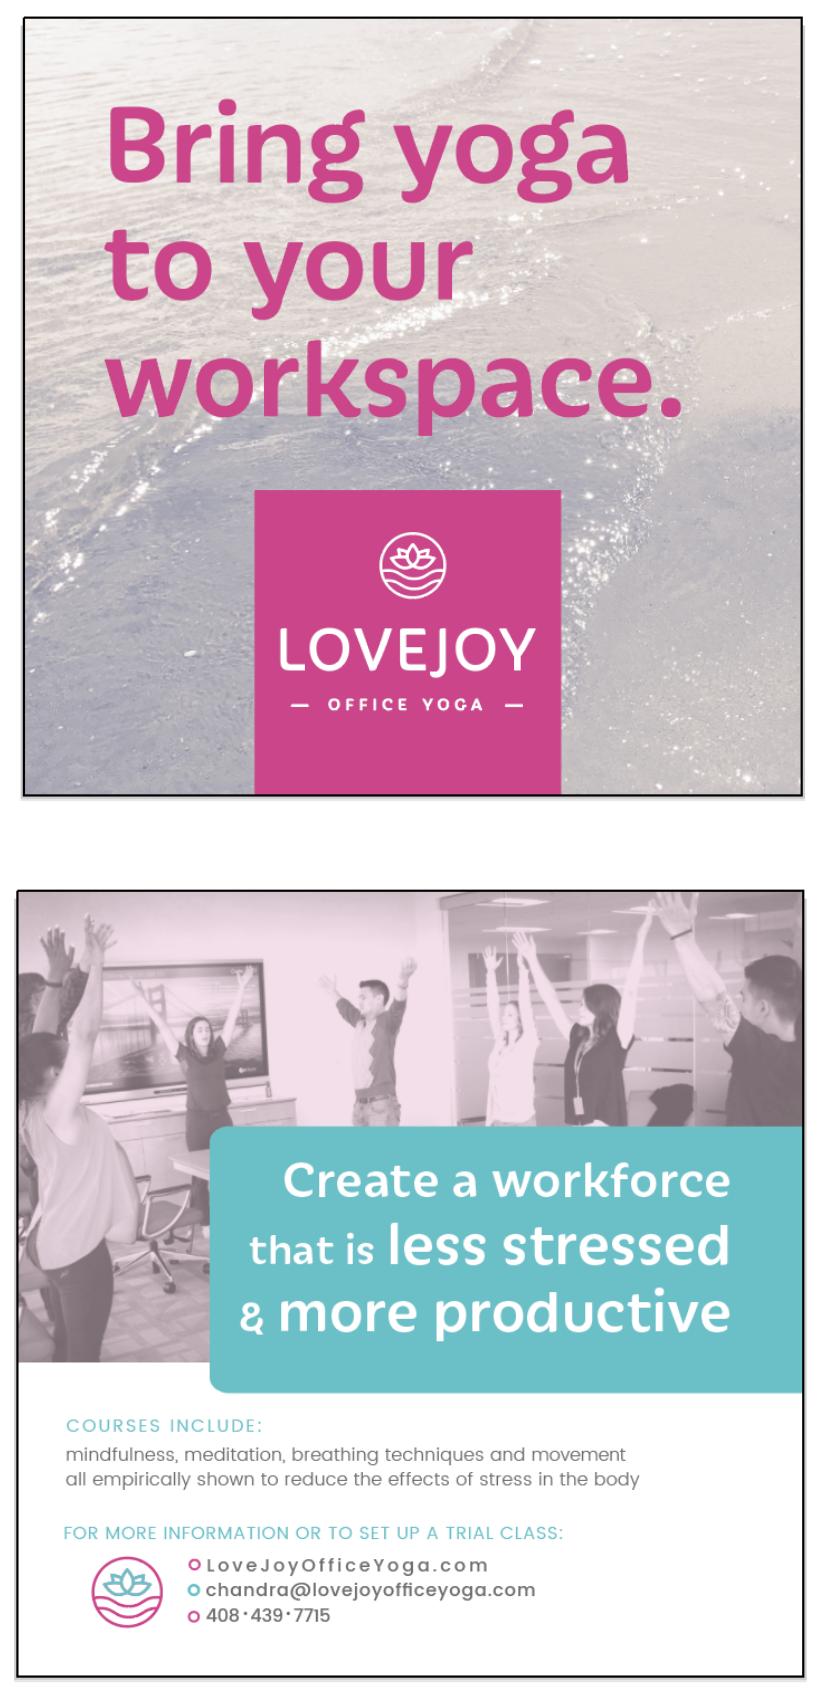 - client: Lovejoy Office Yoga, Sacramentopromotional flyer